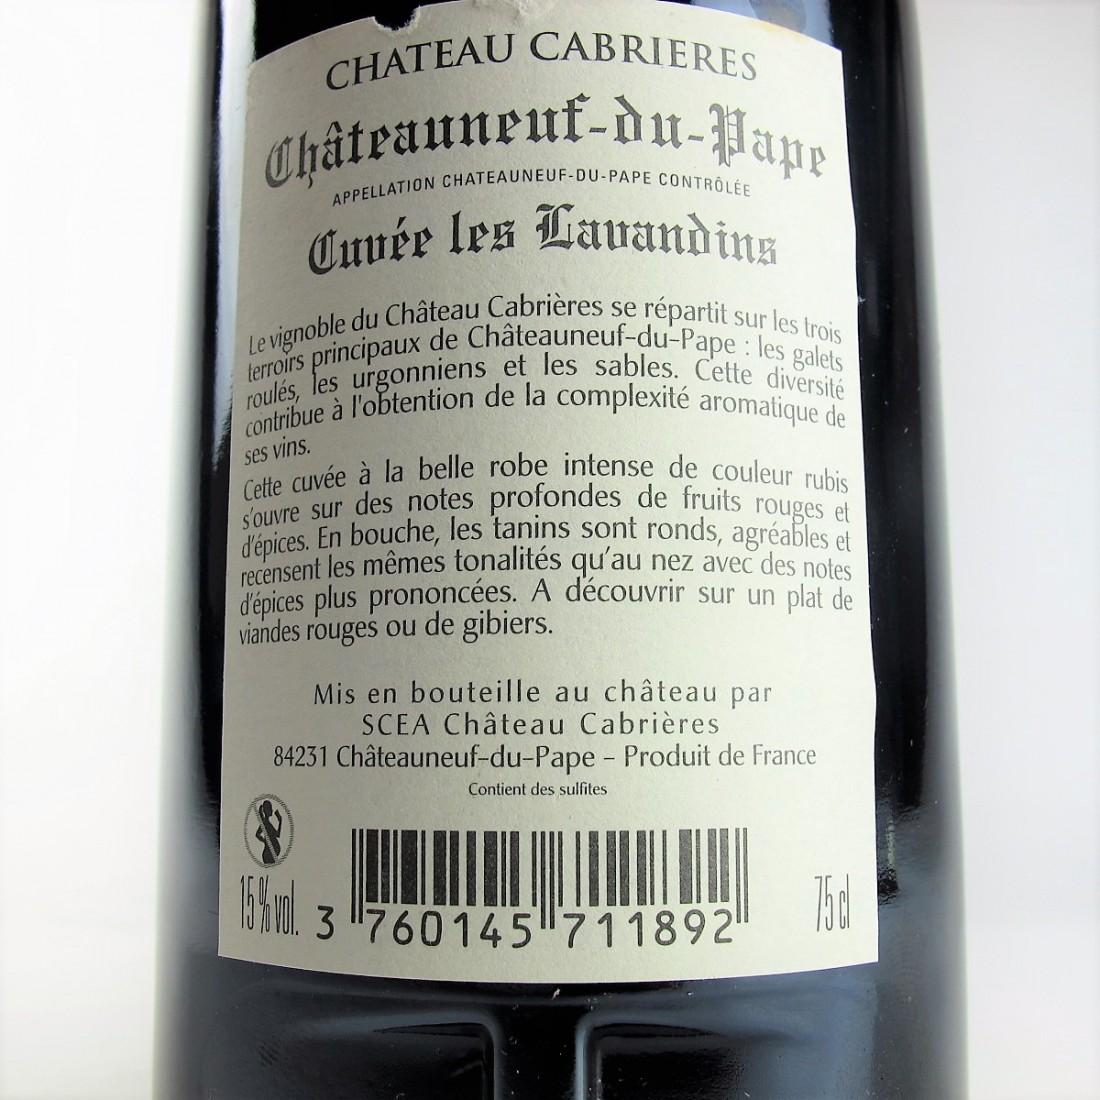 Ch. Cabrieres 2011 Chateauneuf-Du-Pape